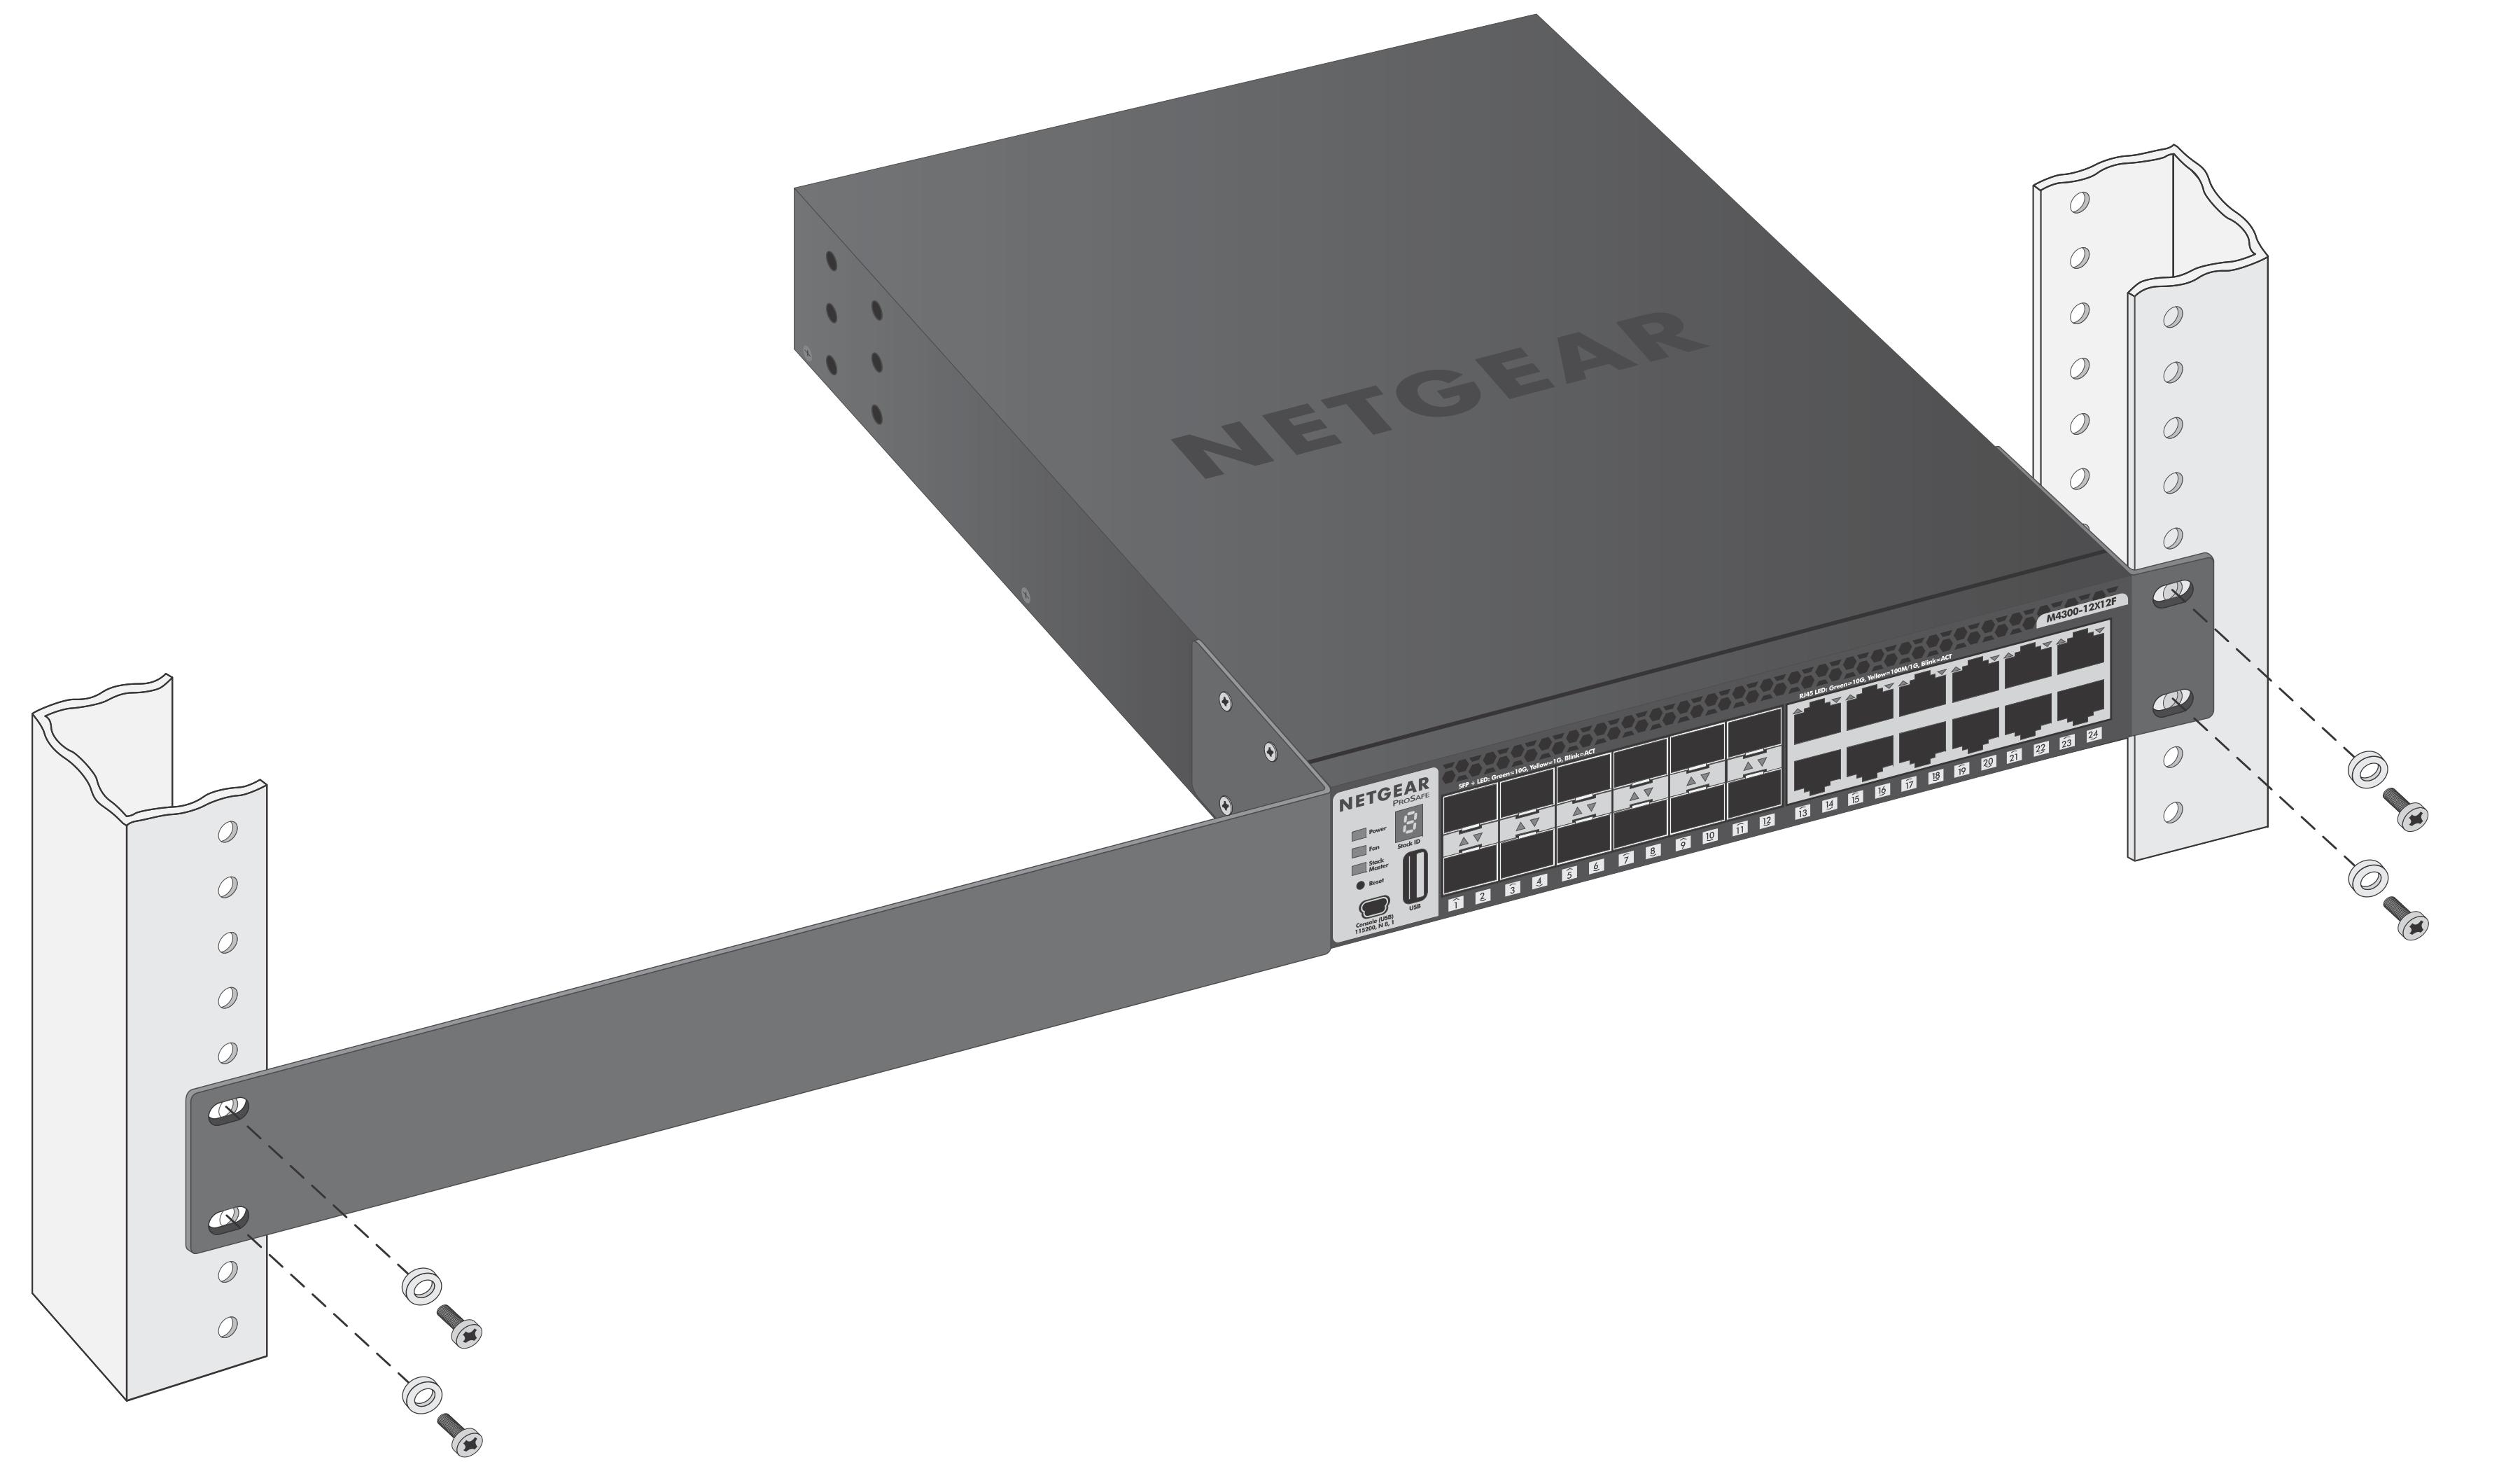 Netgear Prosafe 48x1g Poe Stackable Managed Switch M4300